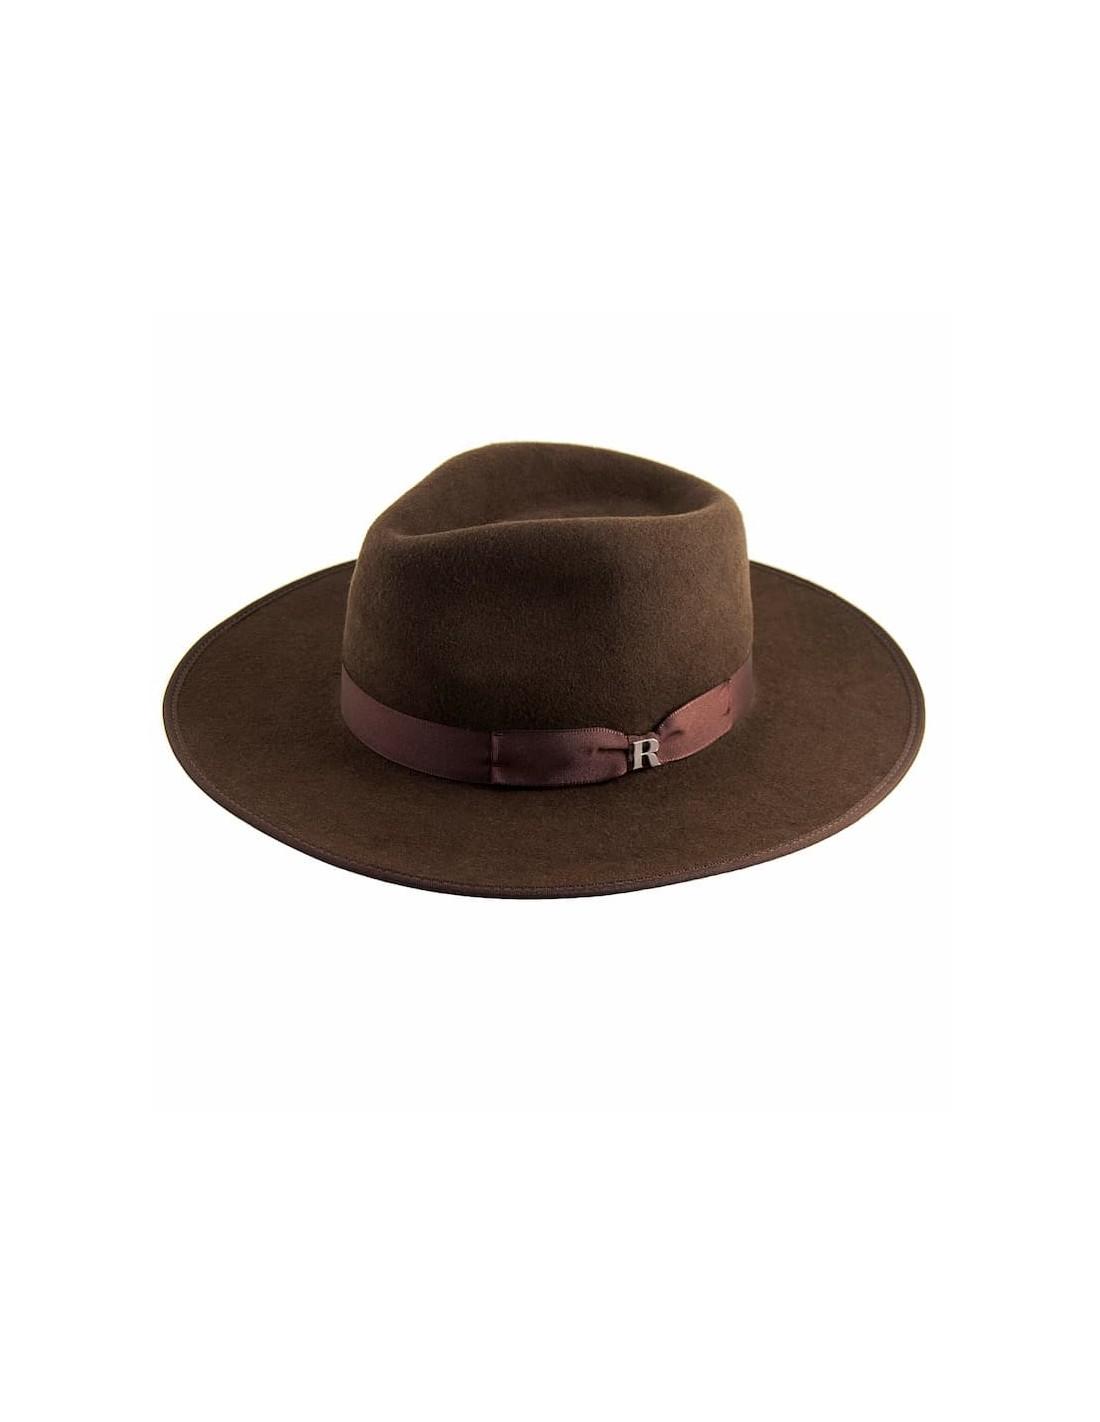 9504345d6d1aed Shop Brown Nuba Hat Wool Felt by Raceu Atelier - Raceu Hats Online